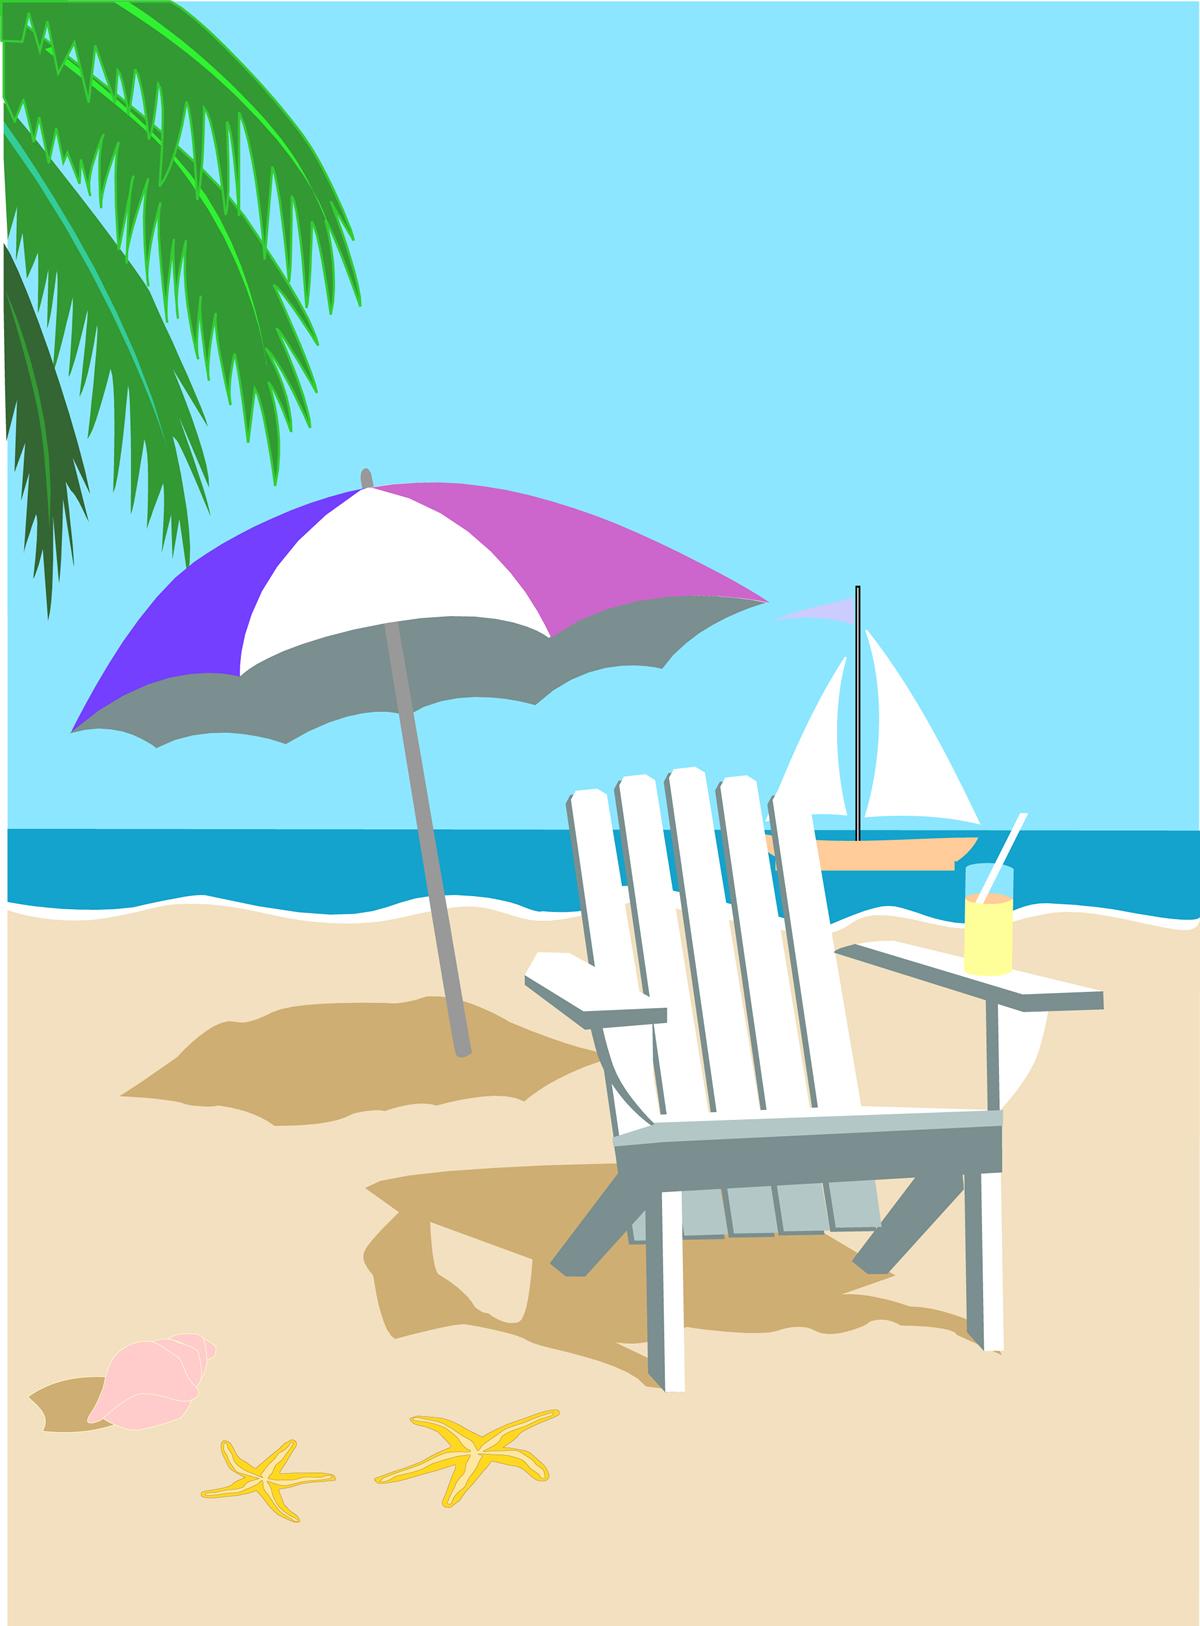 Beach clipart. Free cliparts download clip